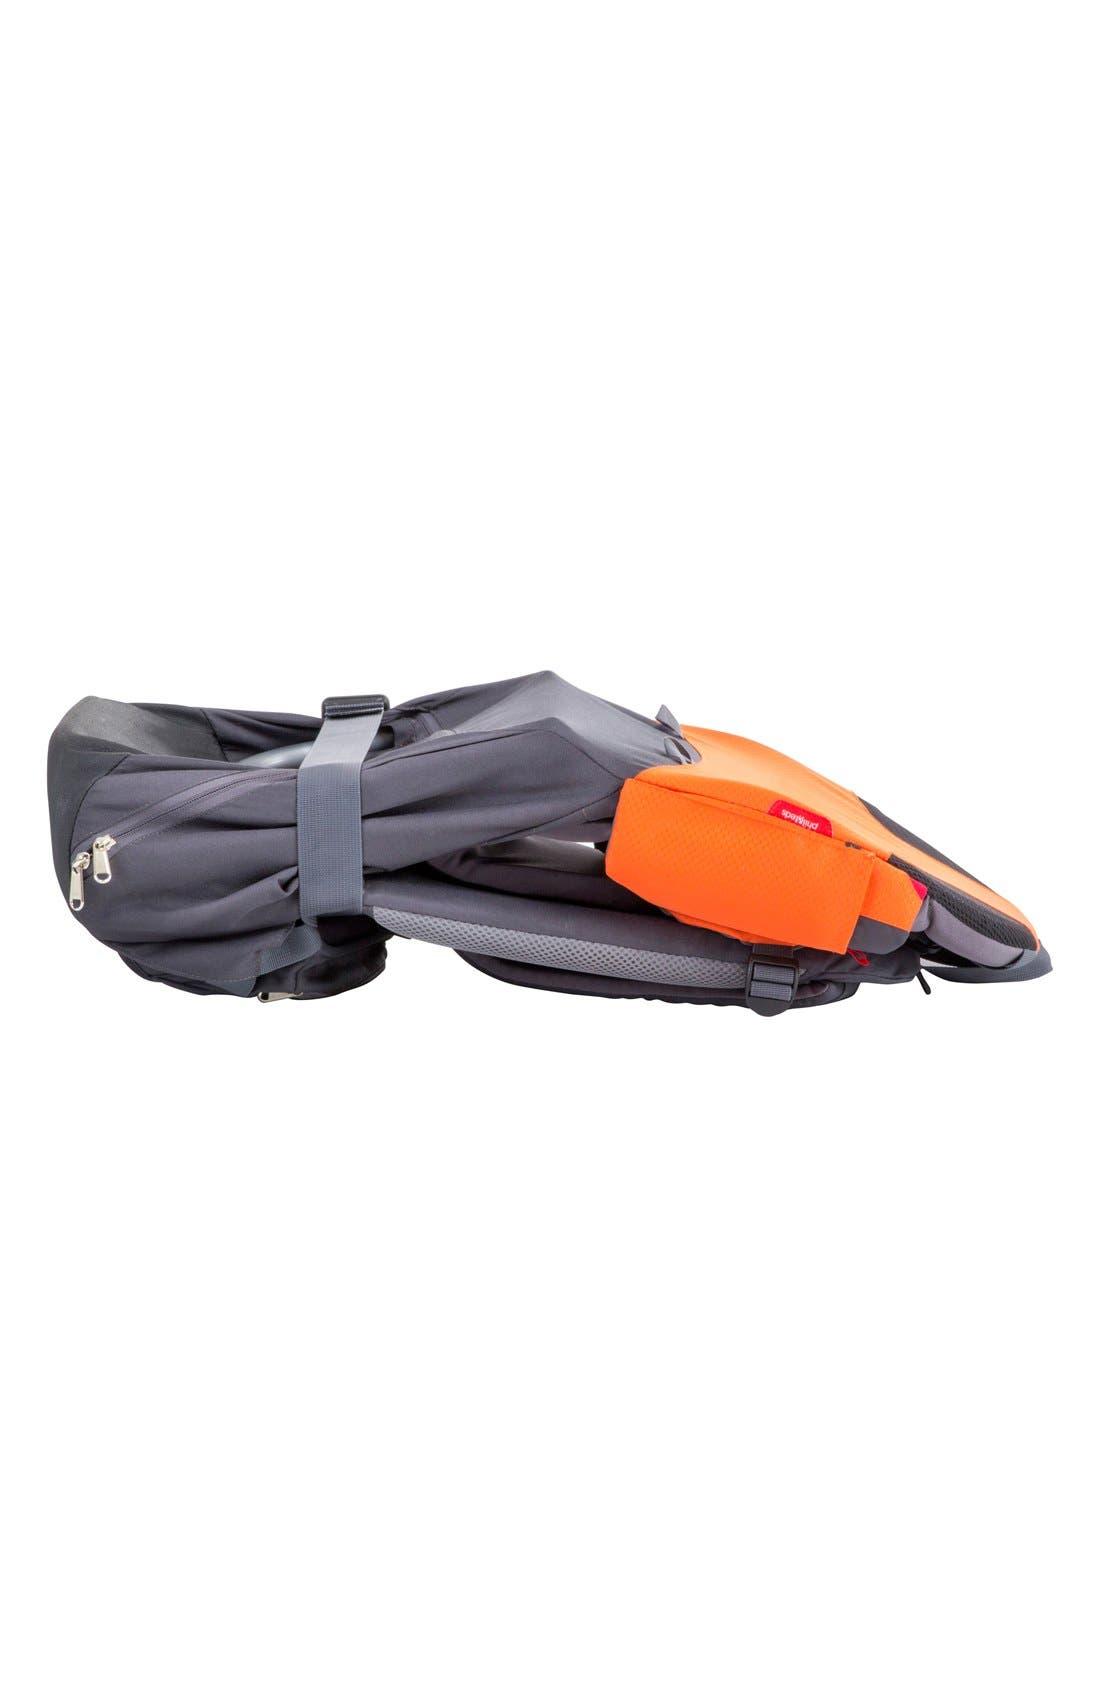 'Parade' Backpack Carrier,                             Alternate thumbnail 3, color,                             Orange/ Grey